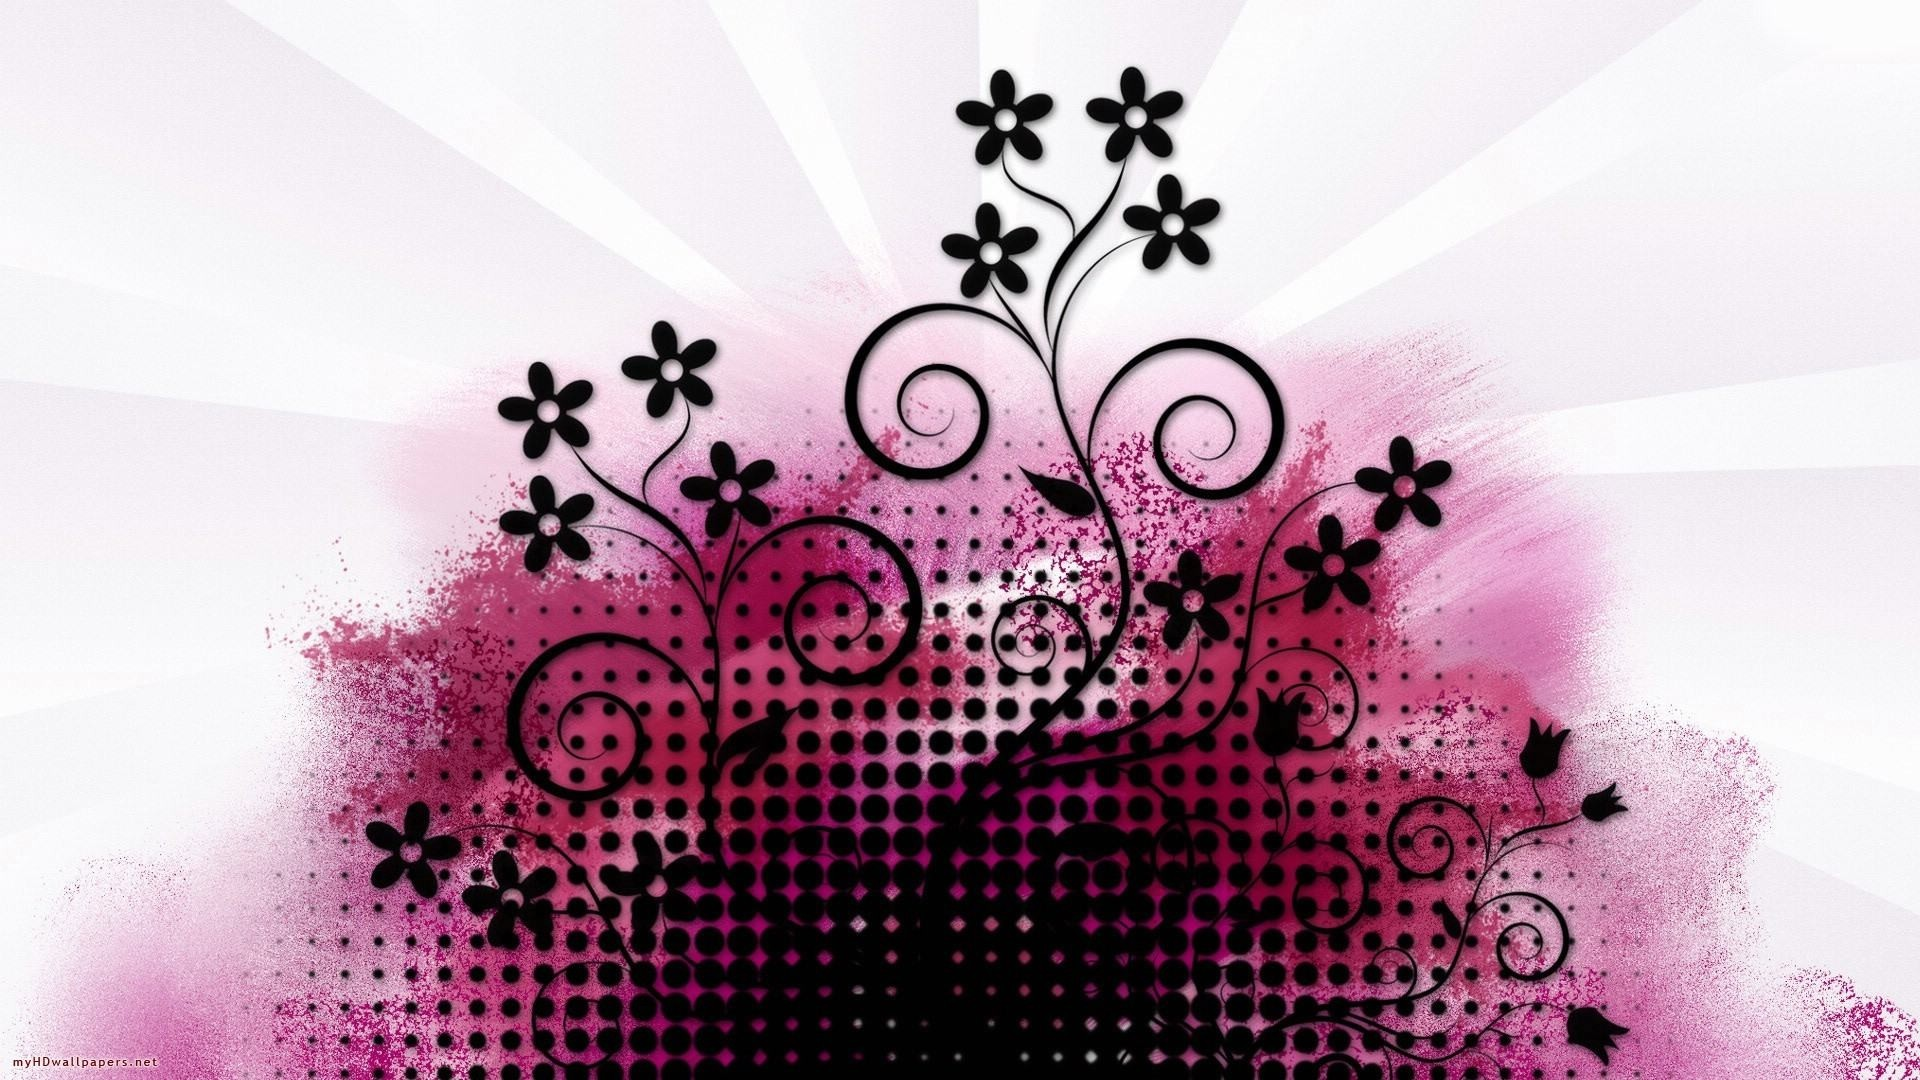 Wallpapers Backgrounds – wallpaper design cool pink wallpapers desktop